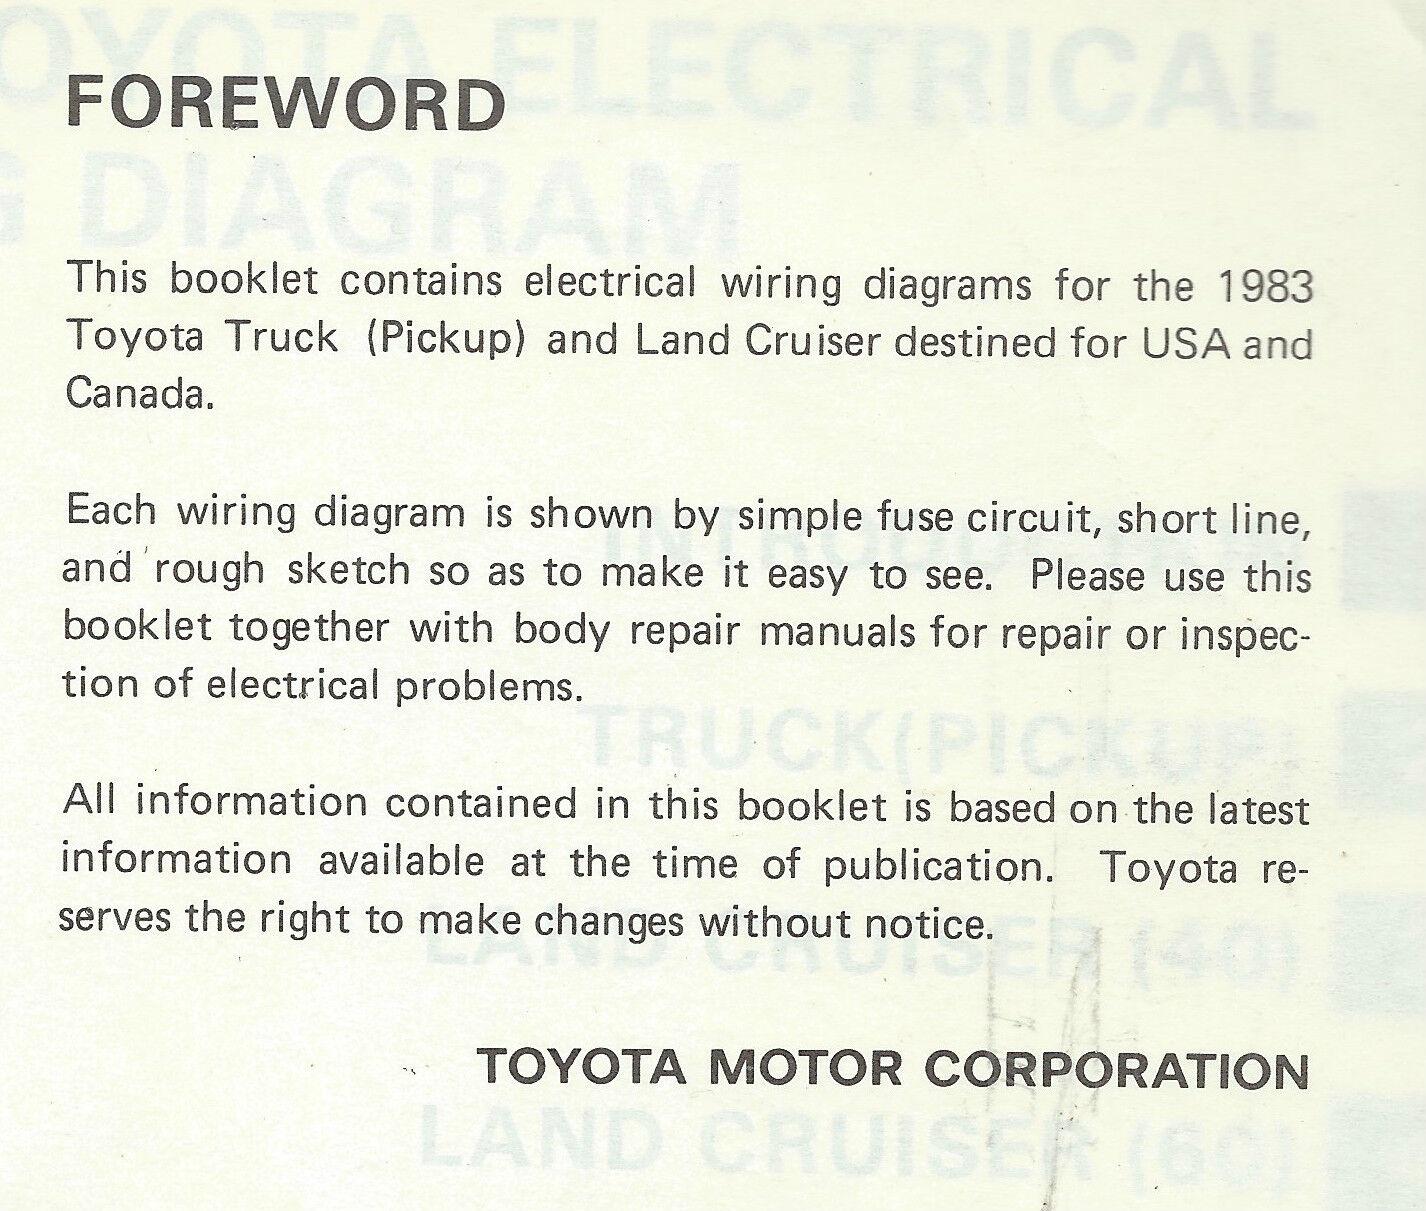 1983 Toyota Land Cruiser Fj Bj 60 Series Electrical Wiring Diagram 1975 Repair Manual